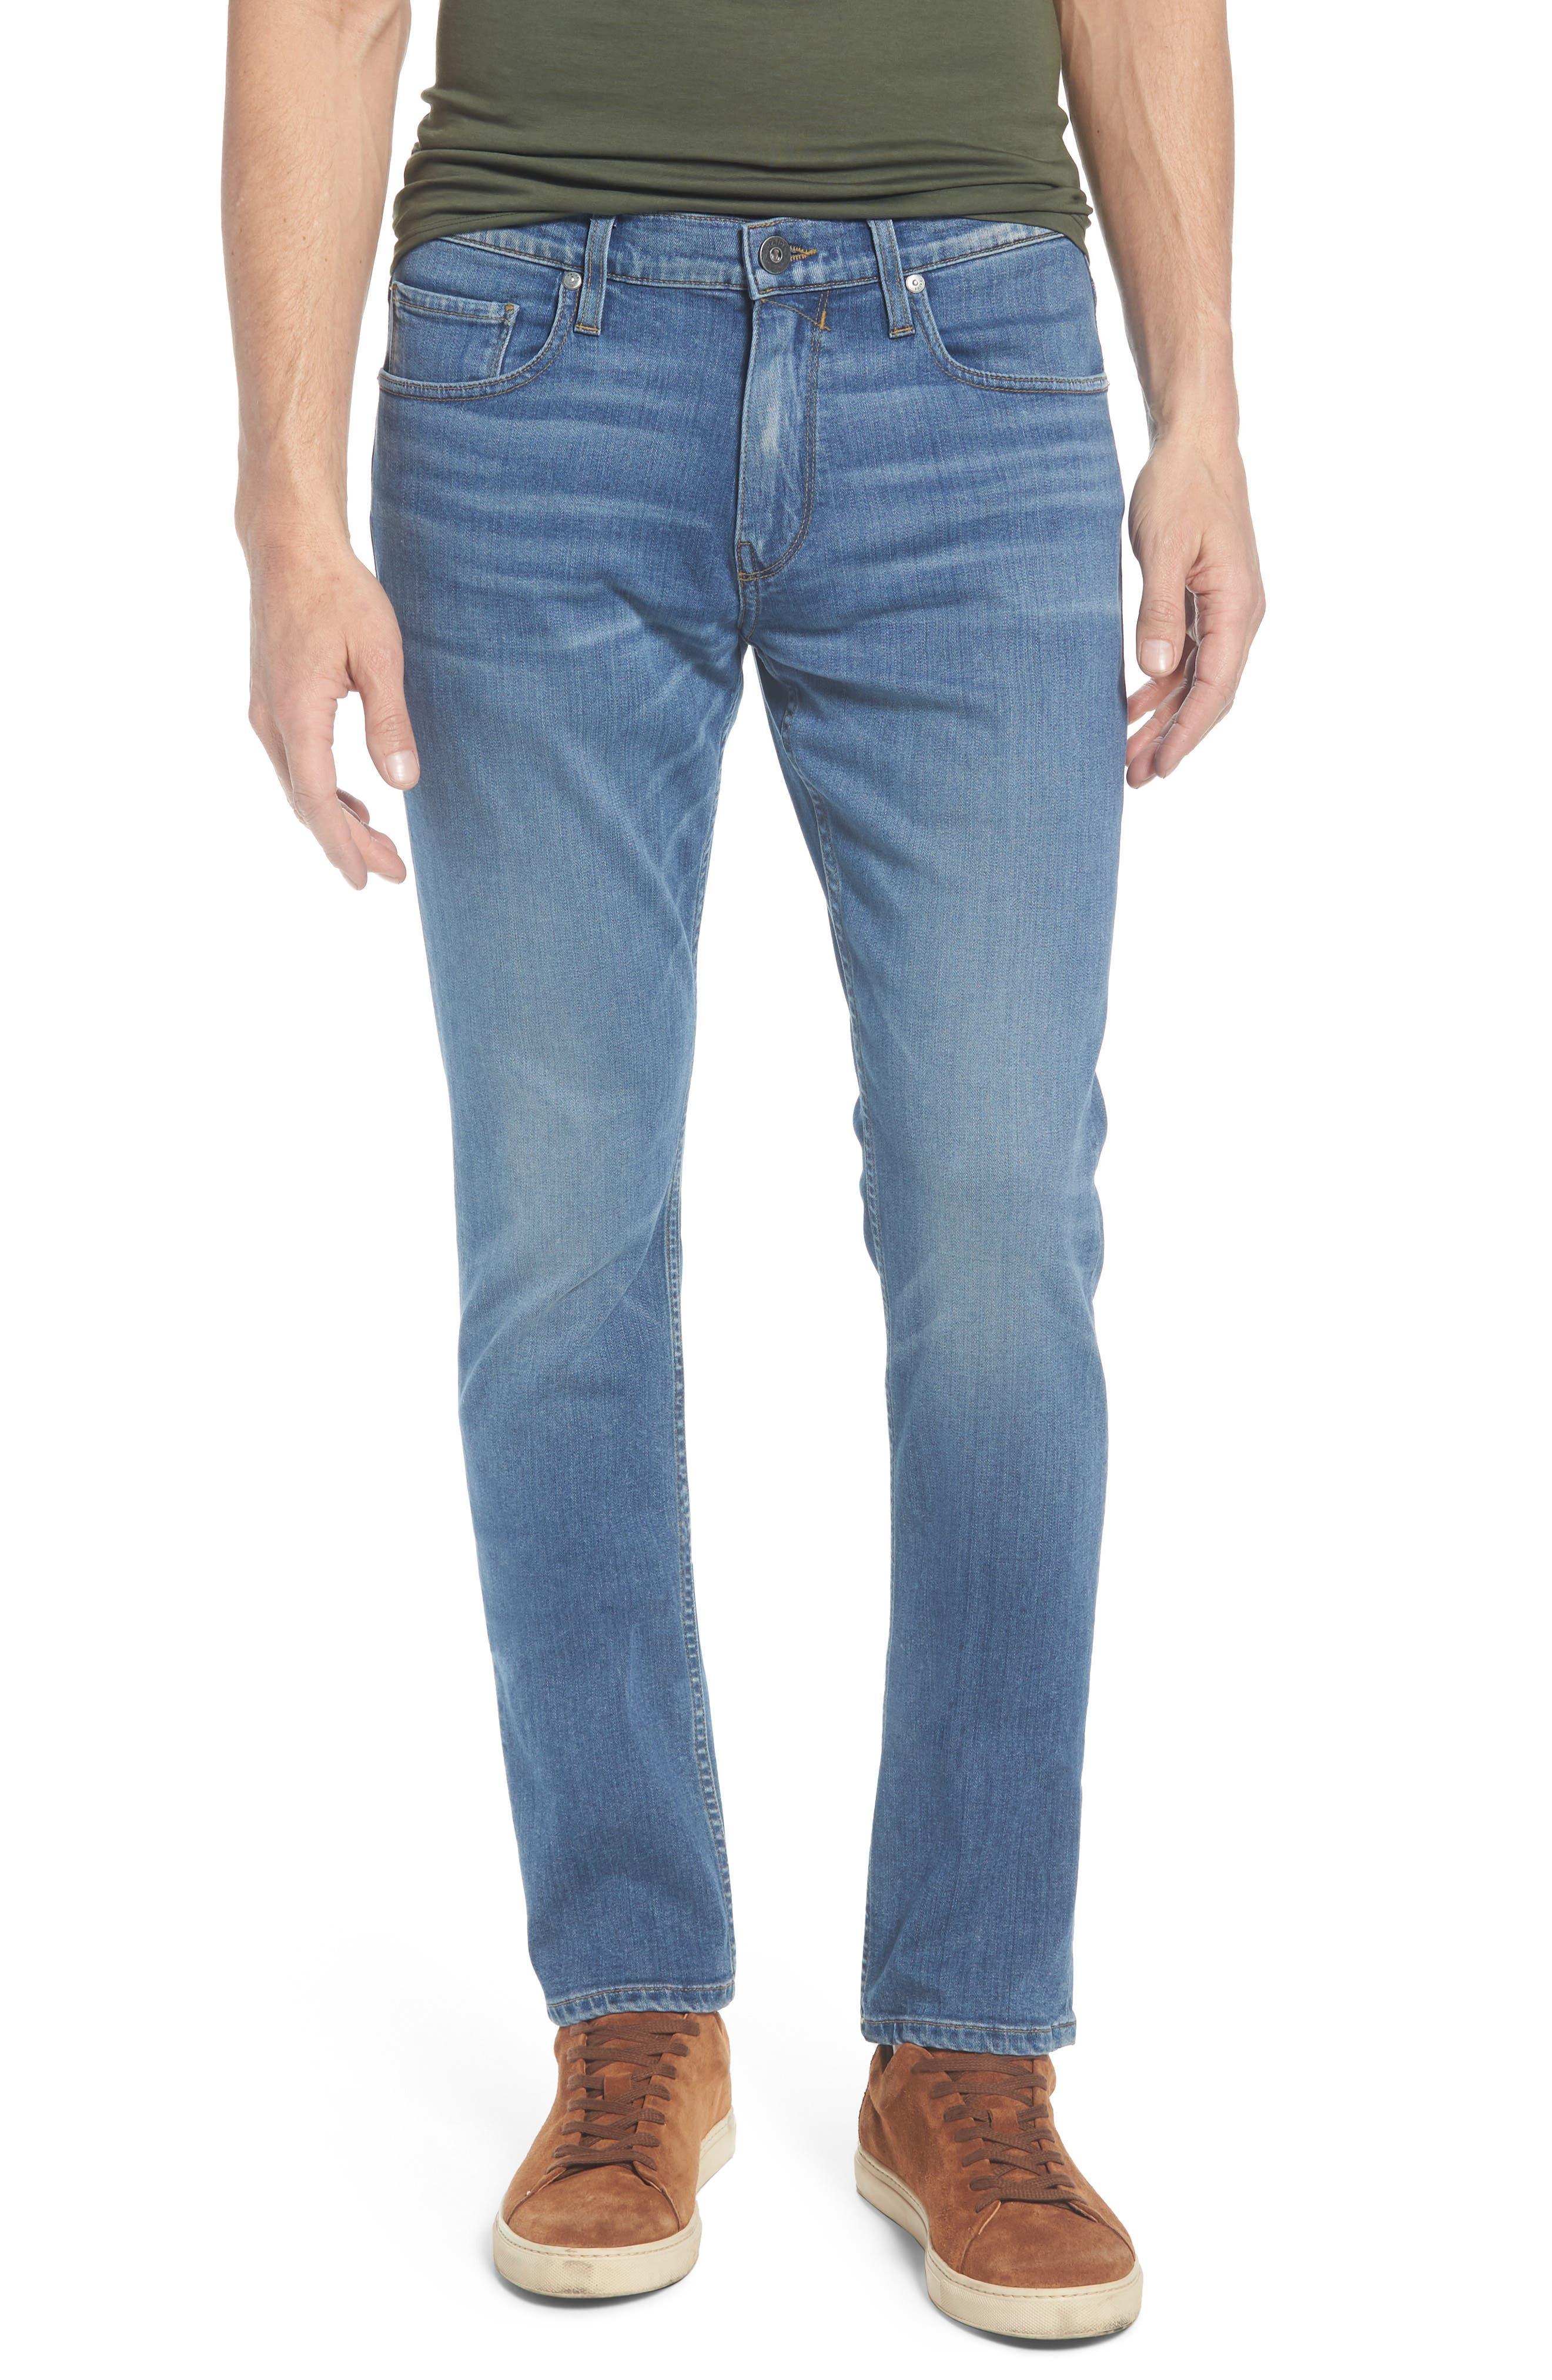 Transcend - Federal Slim Straight Leg Jeans,                             Main thumbnail 1, color,                             Caine